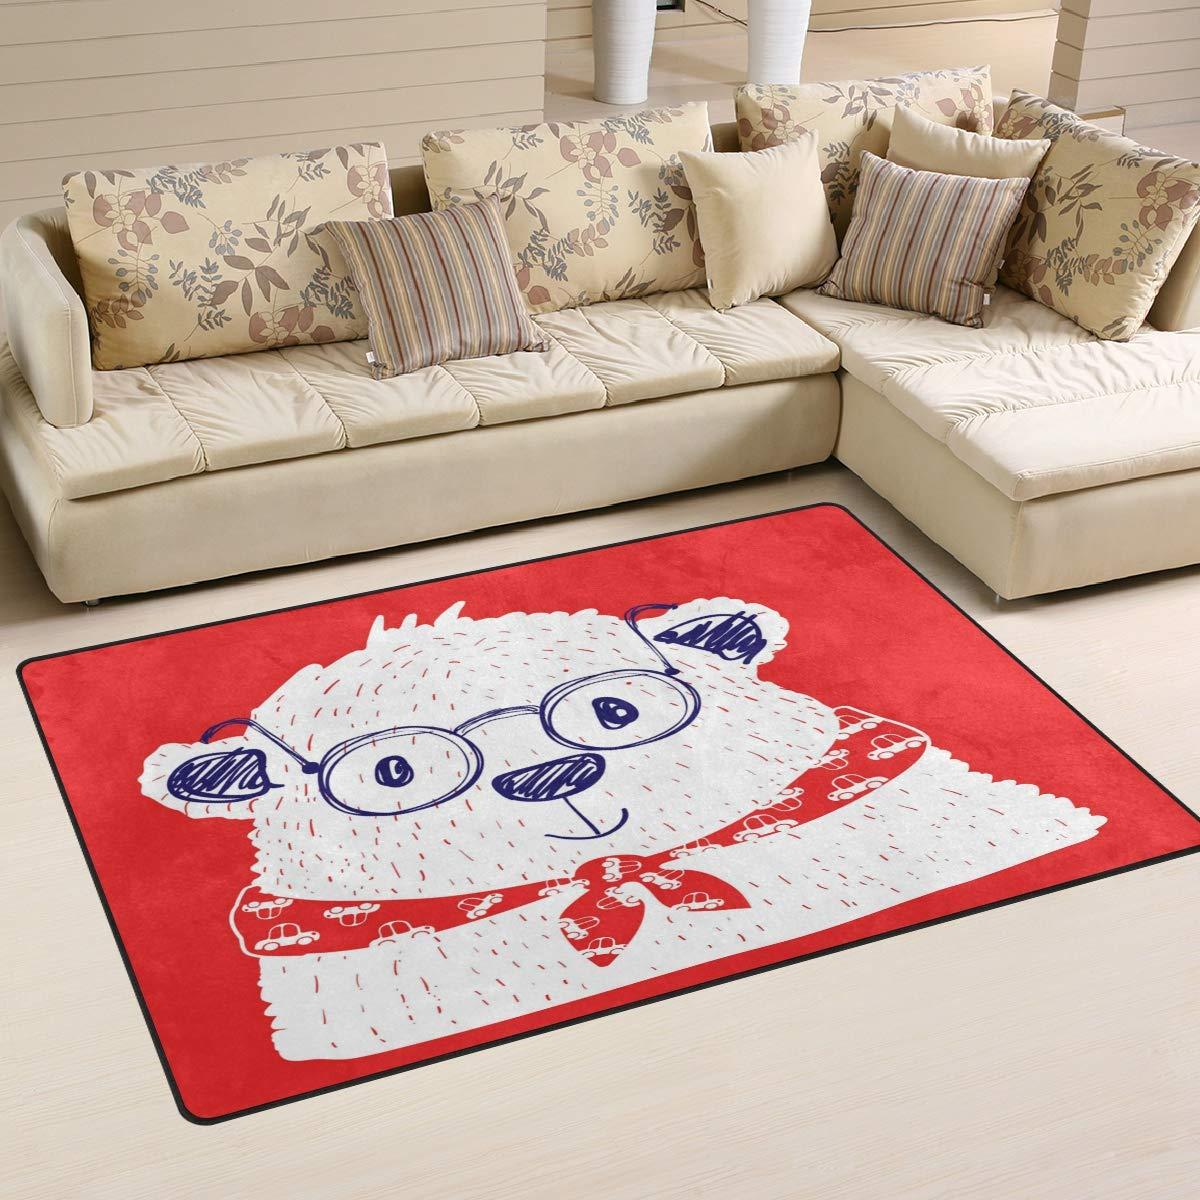 ALAZA Home Decor Little Polar Bear On Red Area Rug Carpet, Rugs Floor Carpet Mat Living Room Carpet for Girl's Room Home Indoor Decor 3'x5'